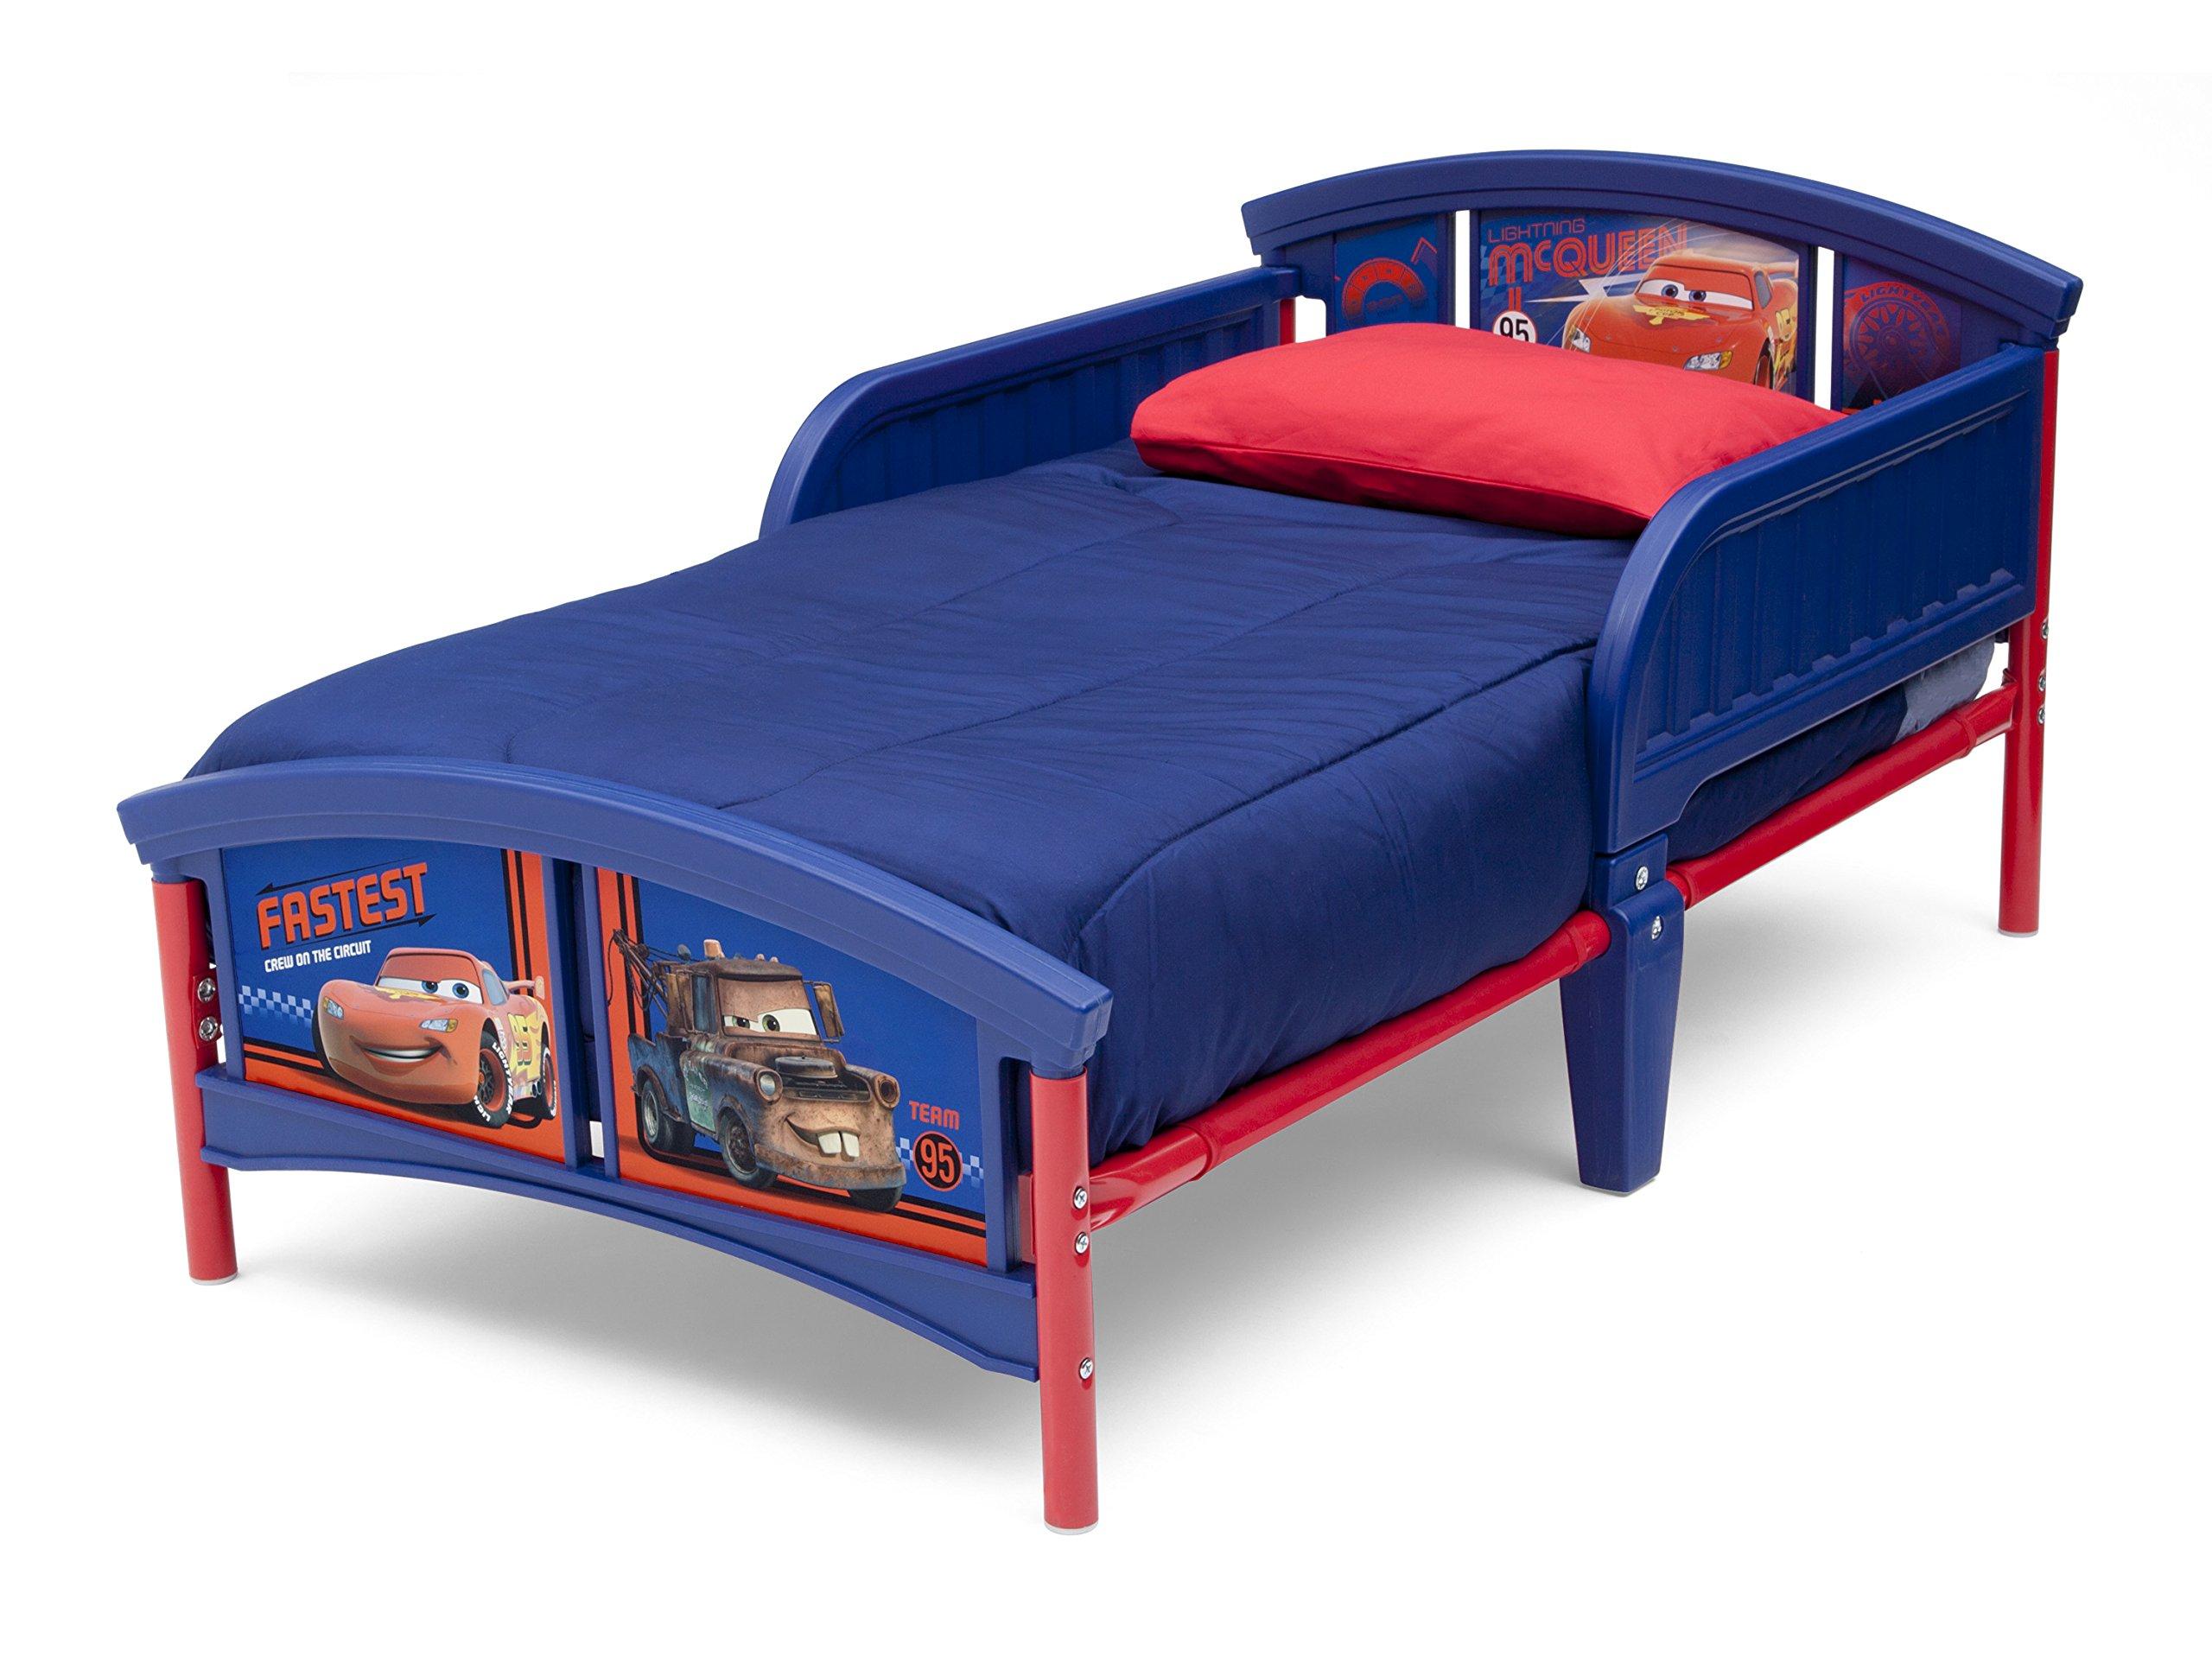 Plastic bedroom furniture